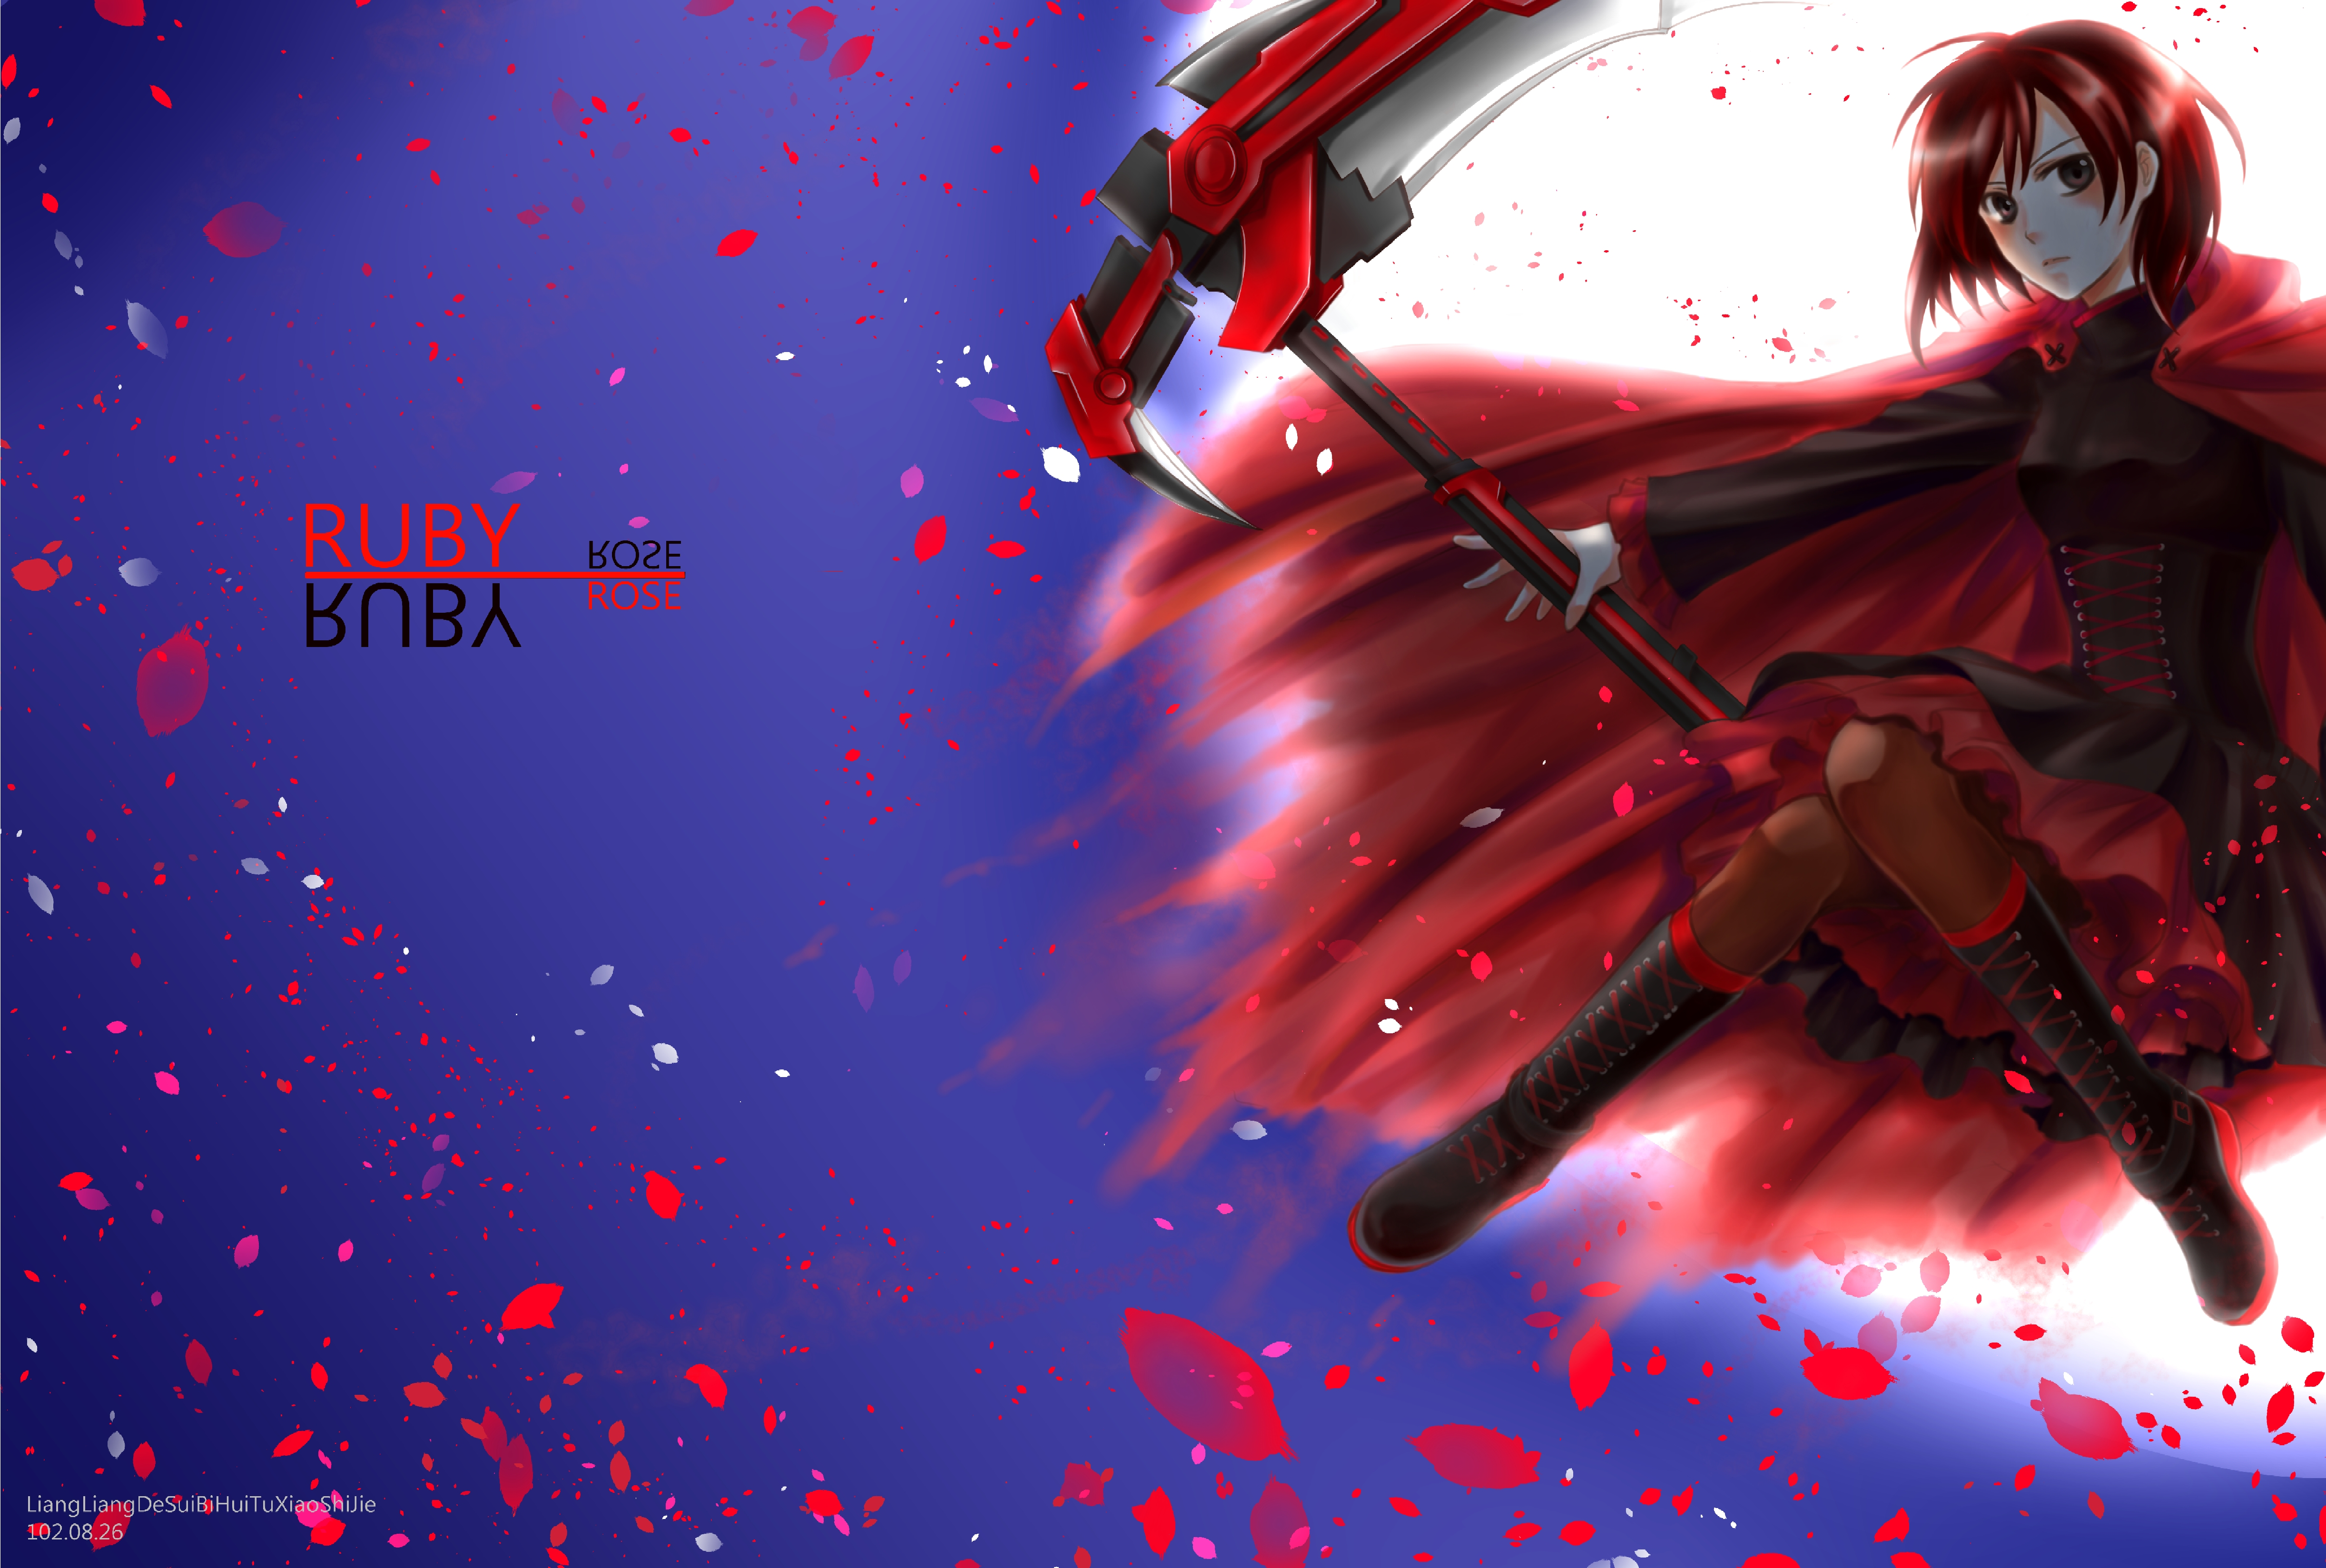 RWBY Ruby Rose hd wallpaper | 4888x3296 | 142934 | WallpaperUP